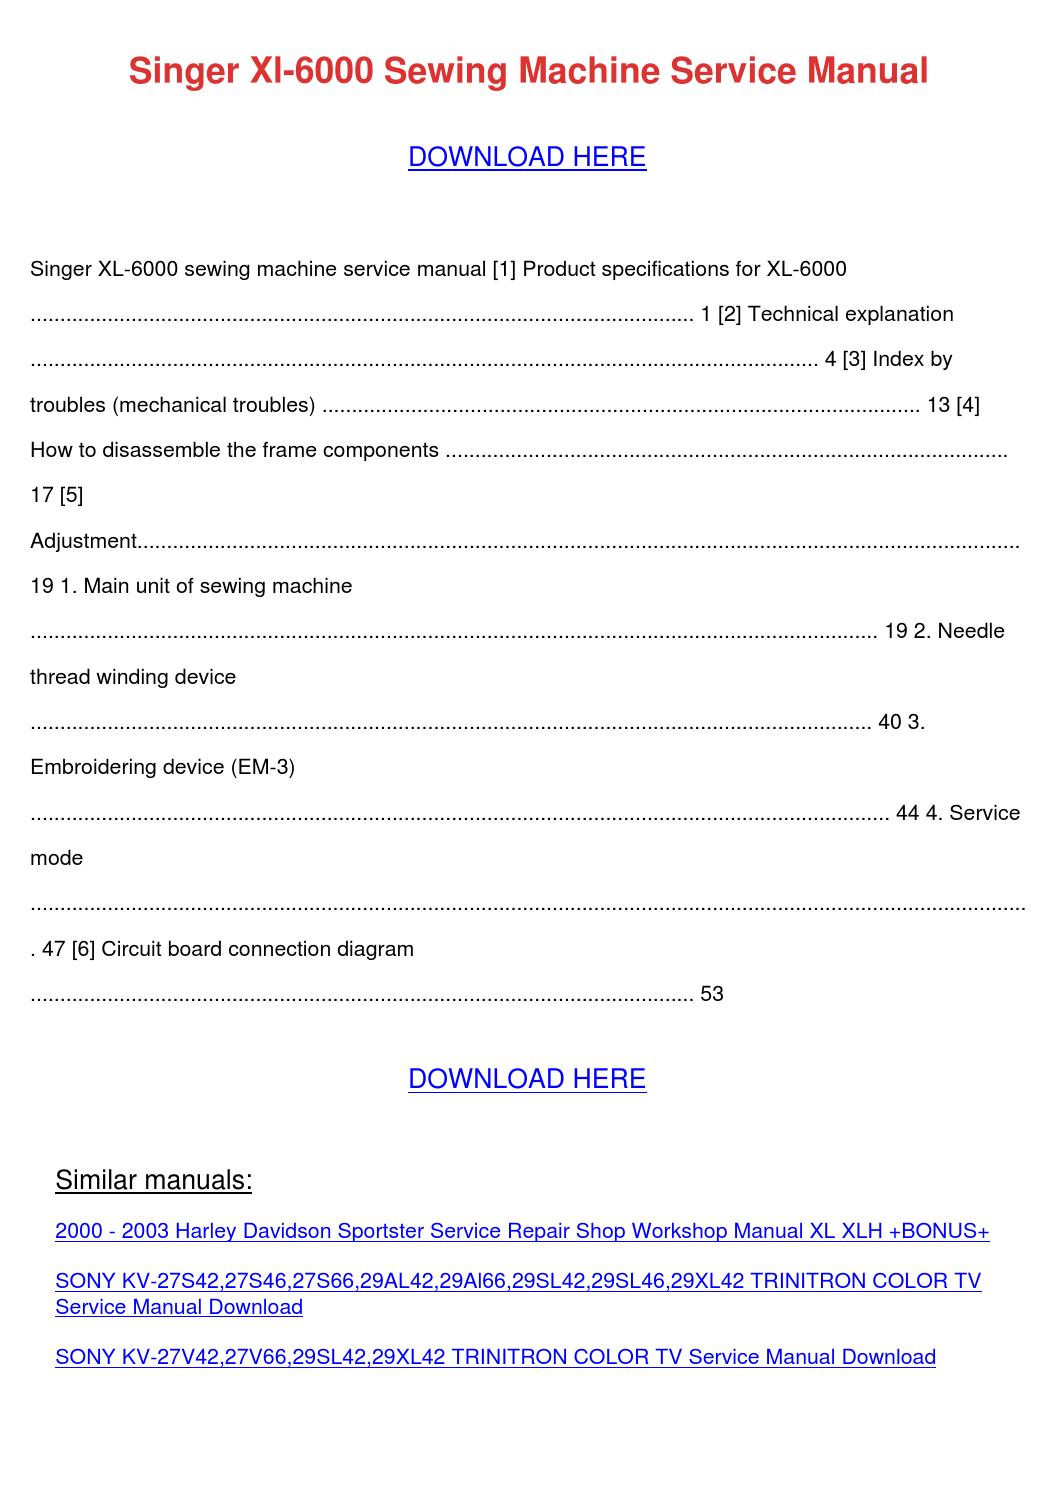 canon digital ixus 75 manual pdf